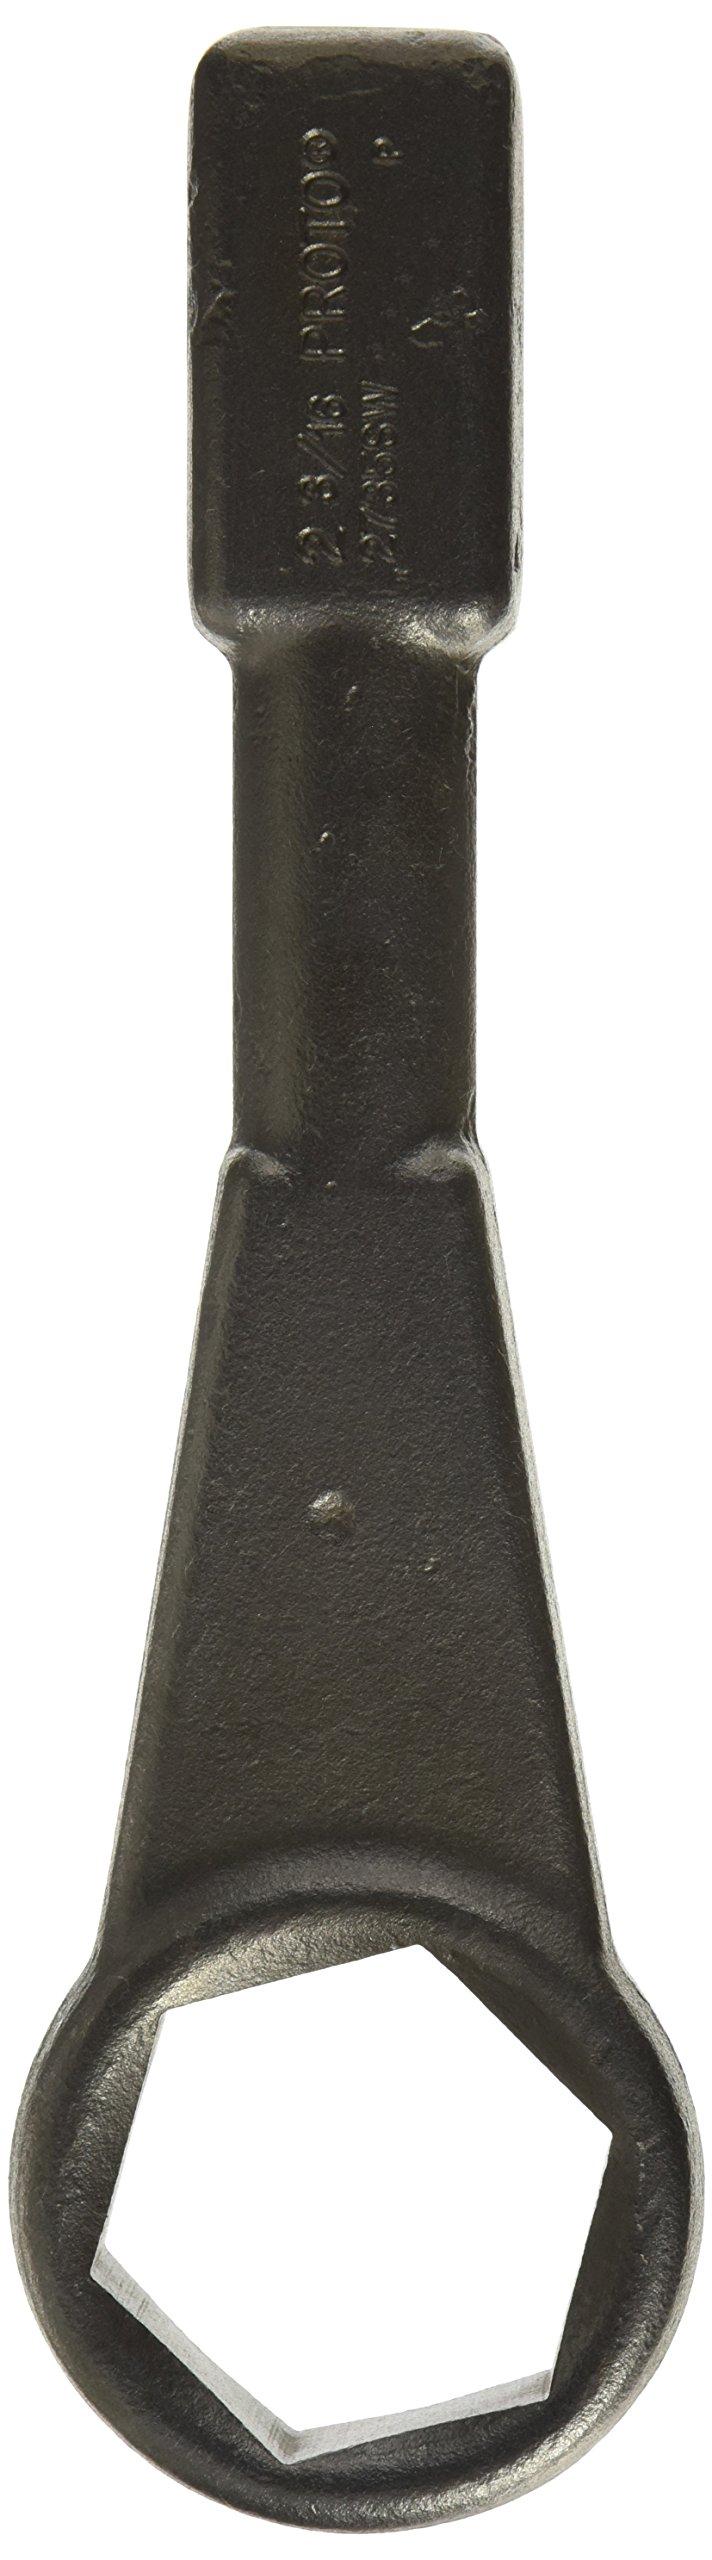 Proto - Heavy-Duty Striking Wrench 2-3/16'' - 6 Pt. (J2735SW)